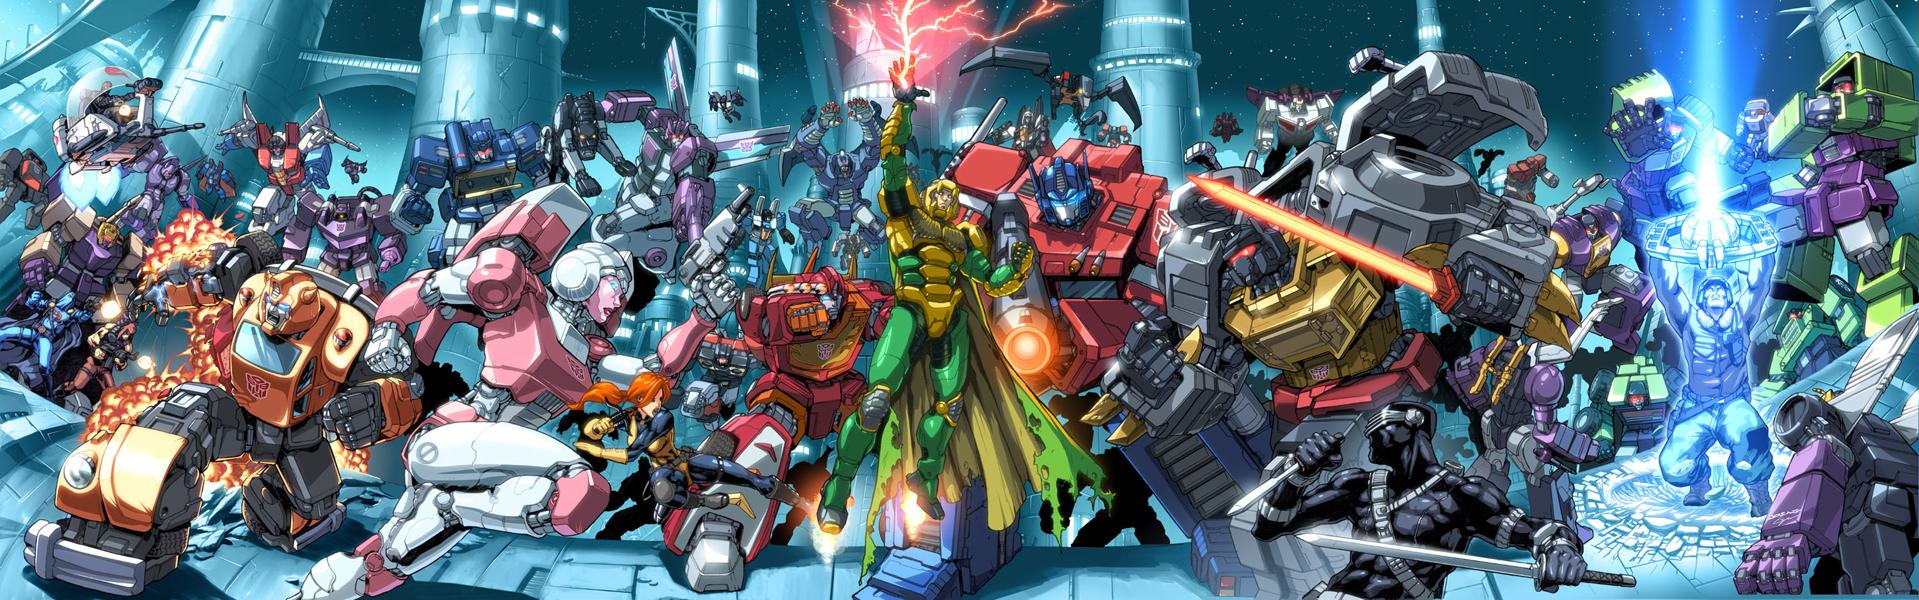 GI Joe V Transformers